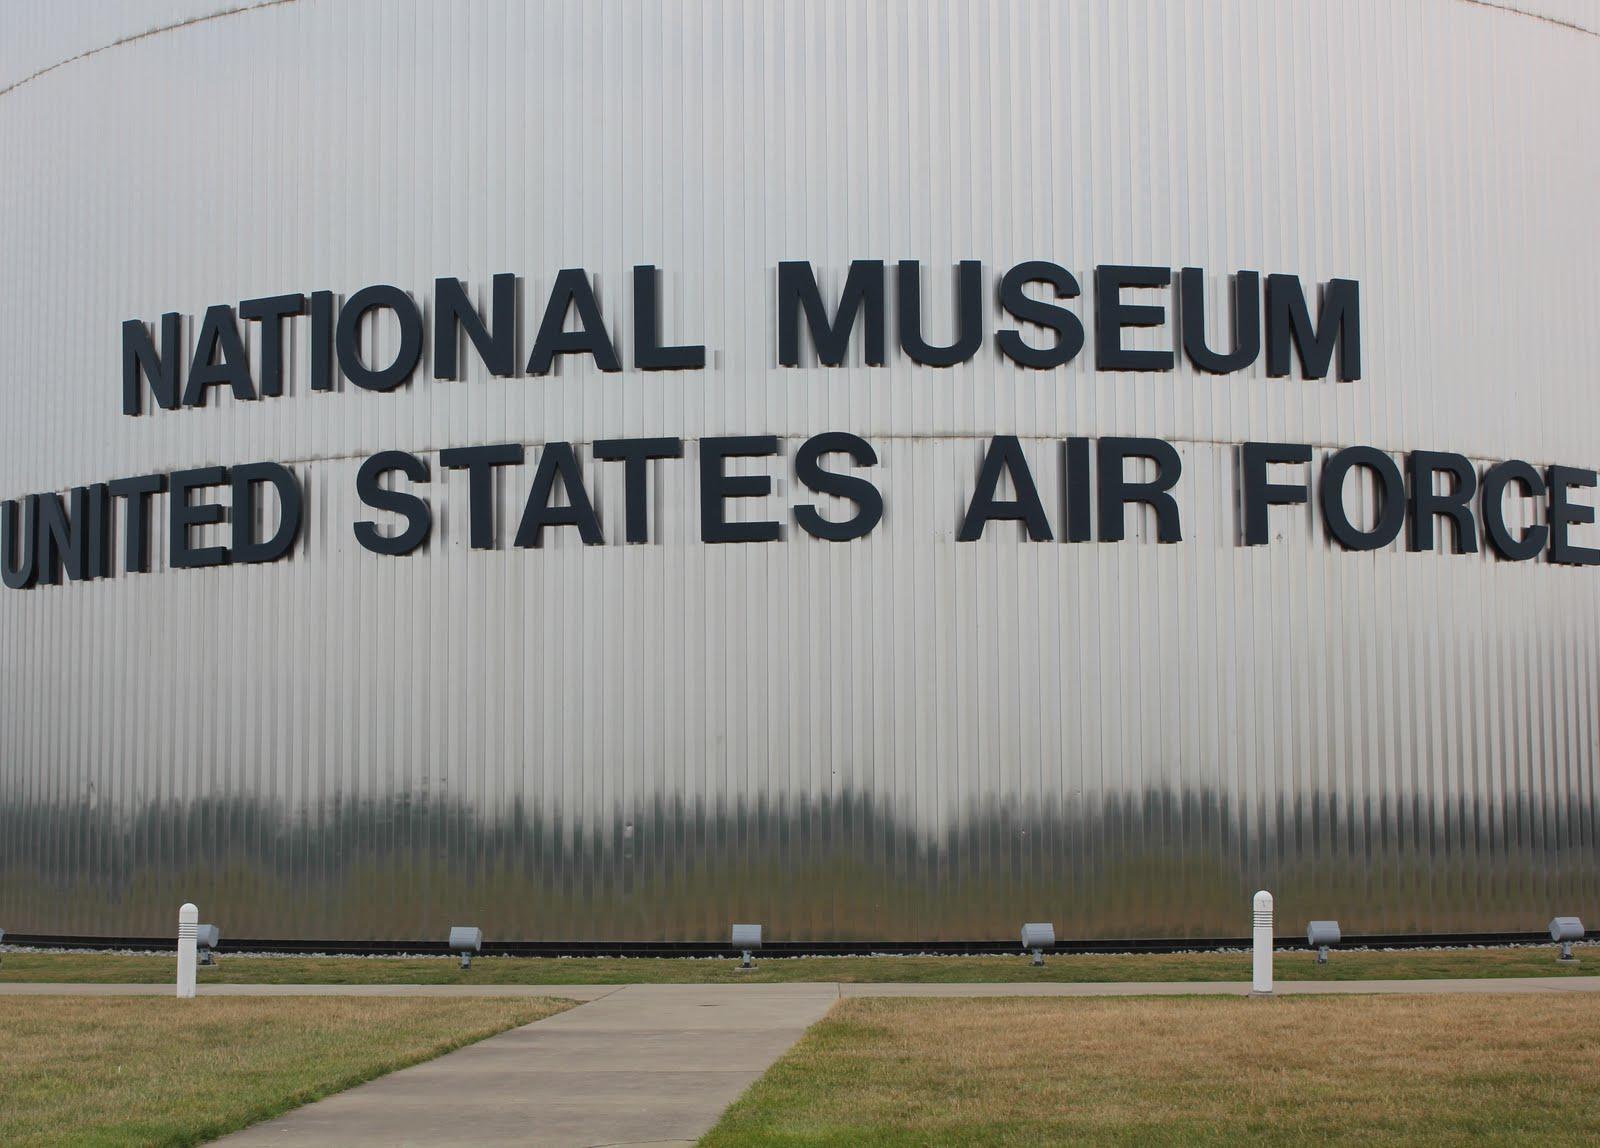 southwestern carribbean breezes united states air force museum dayton ohio. Black Bedroom Furniture Sets. Home Design Ideas